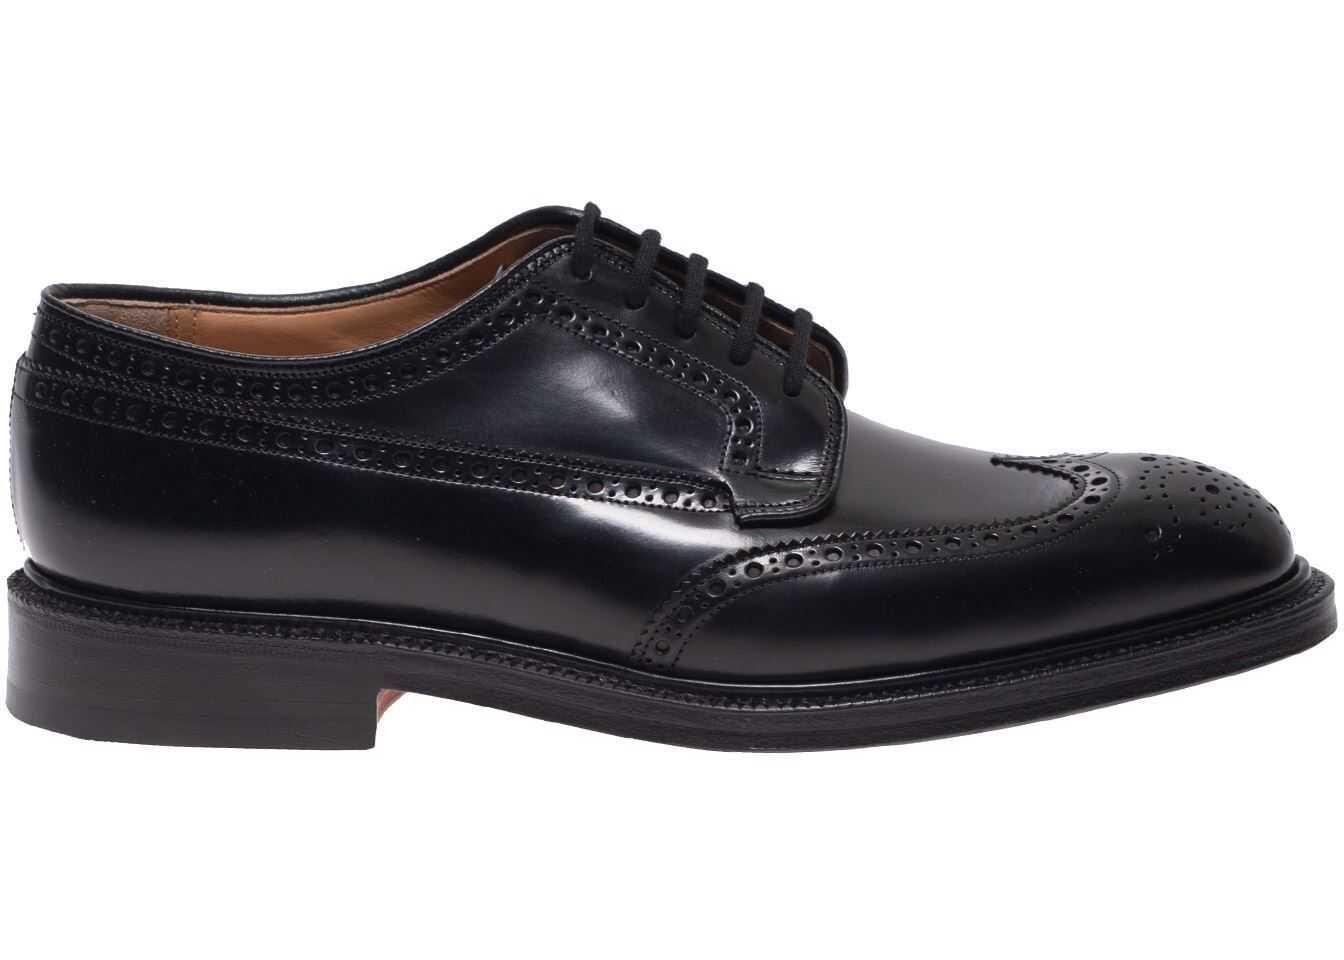 Grafton 173 Brogue Derby Shoes In Black thumbnail